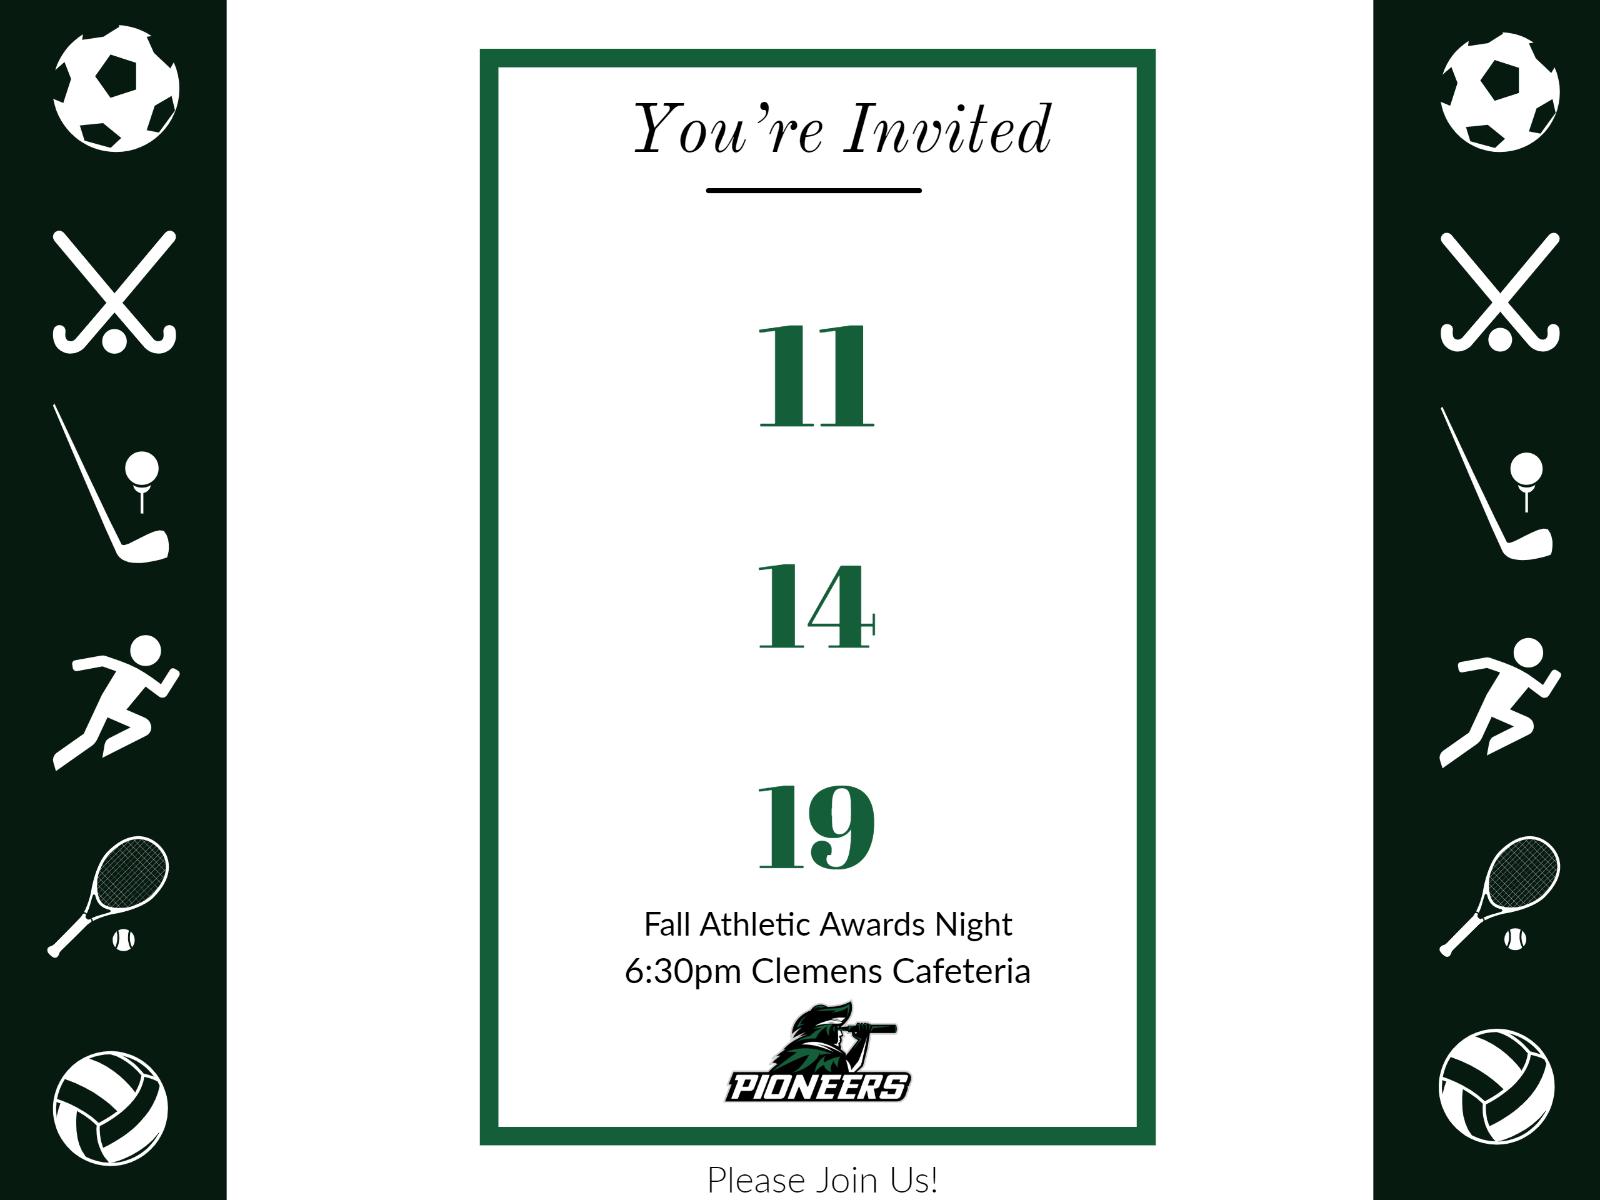 2019 Fall Athletic Awards Night